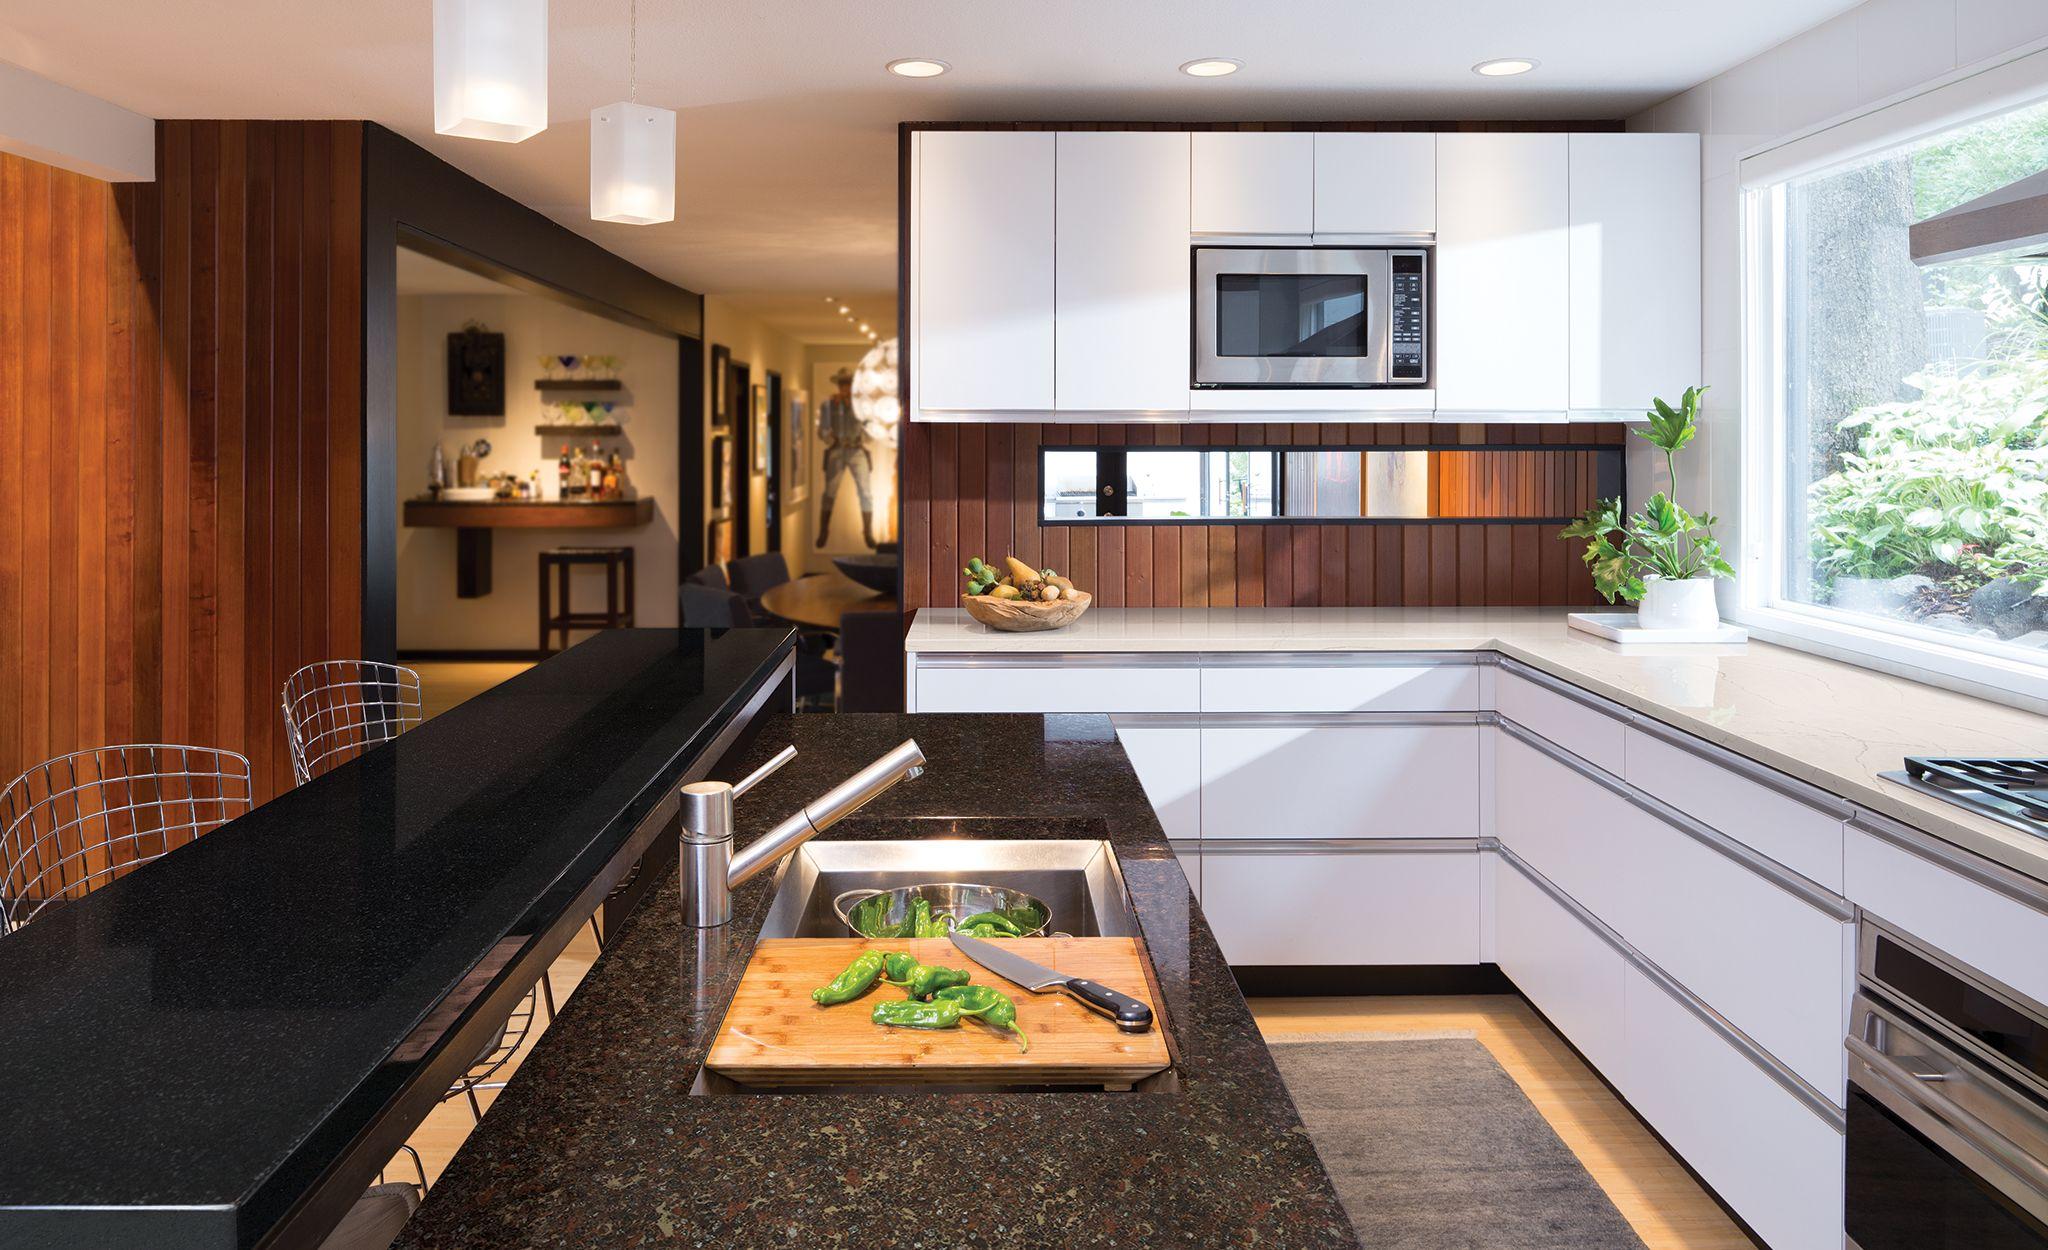 A trio of Cambria designs pair perfectly in this midcentury modern space. Cambria Black, Cambria Hamilton, and Cambria Ella